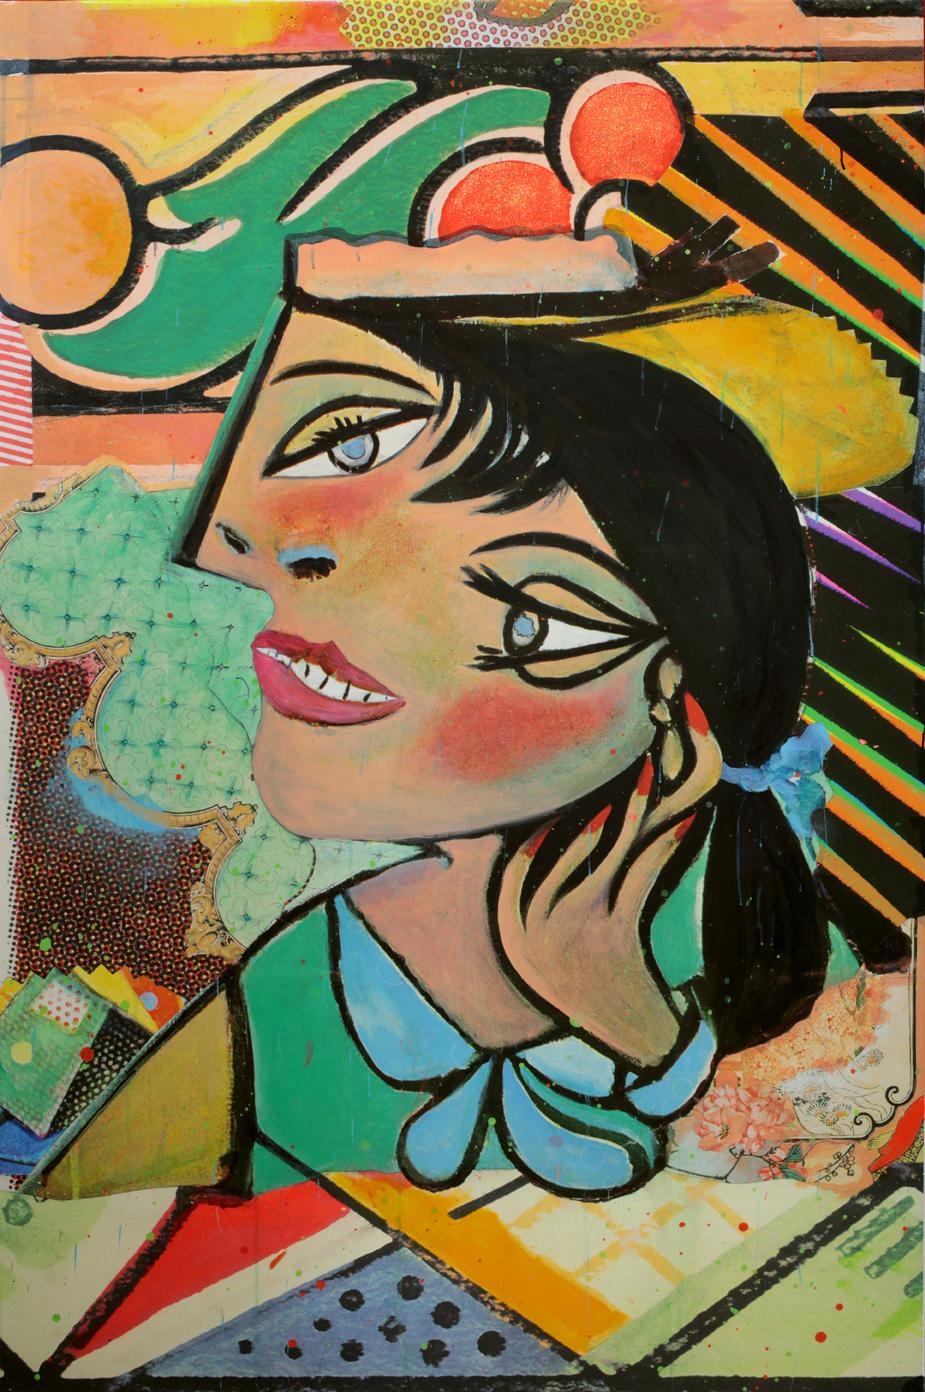 Polka Dot Picasso